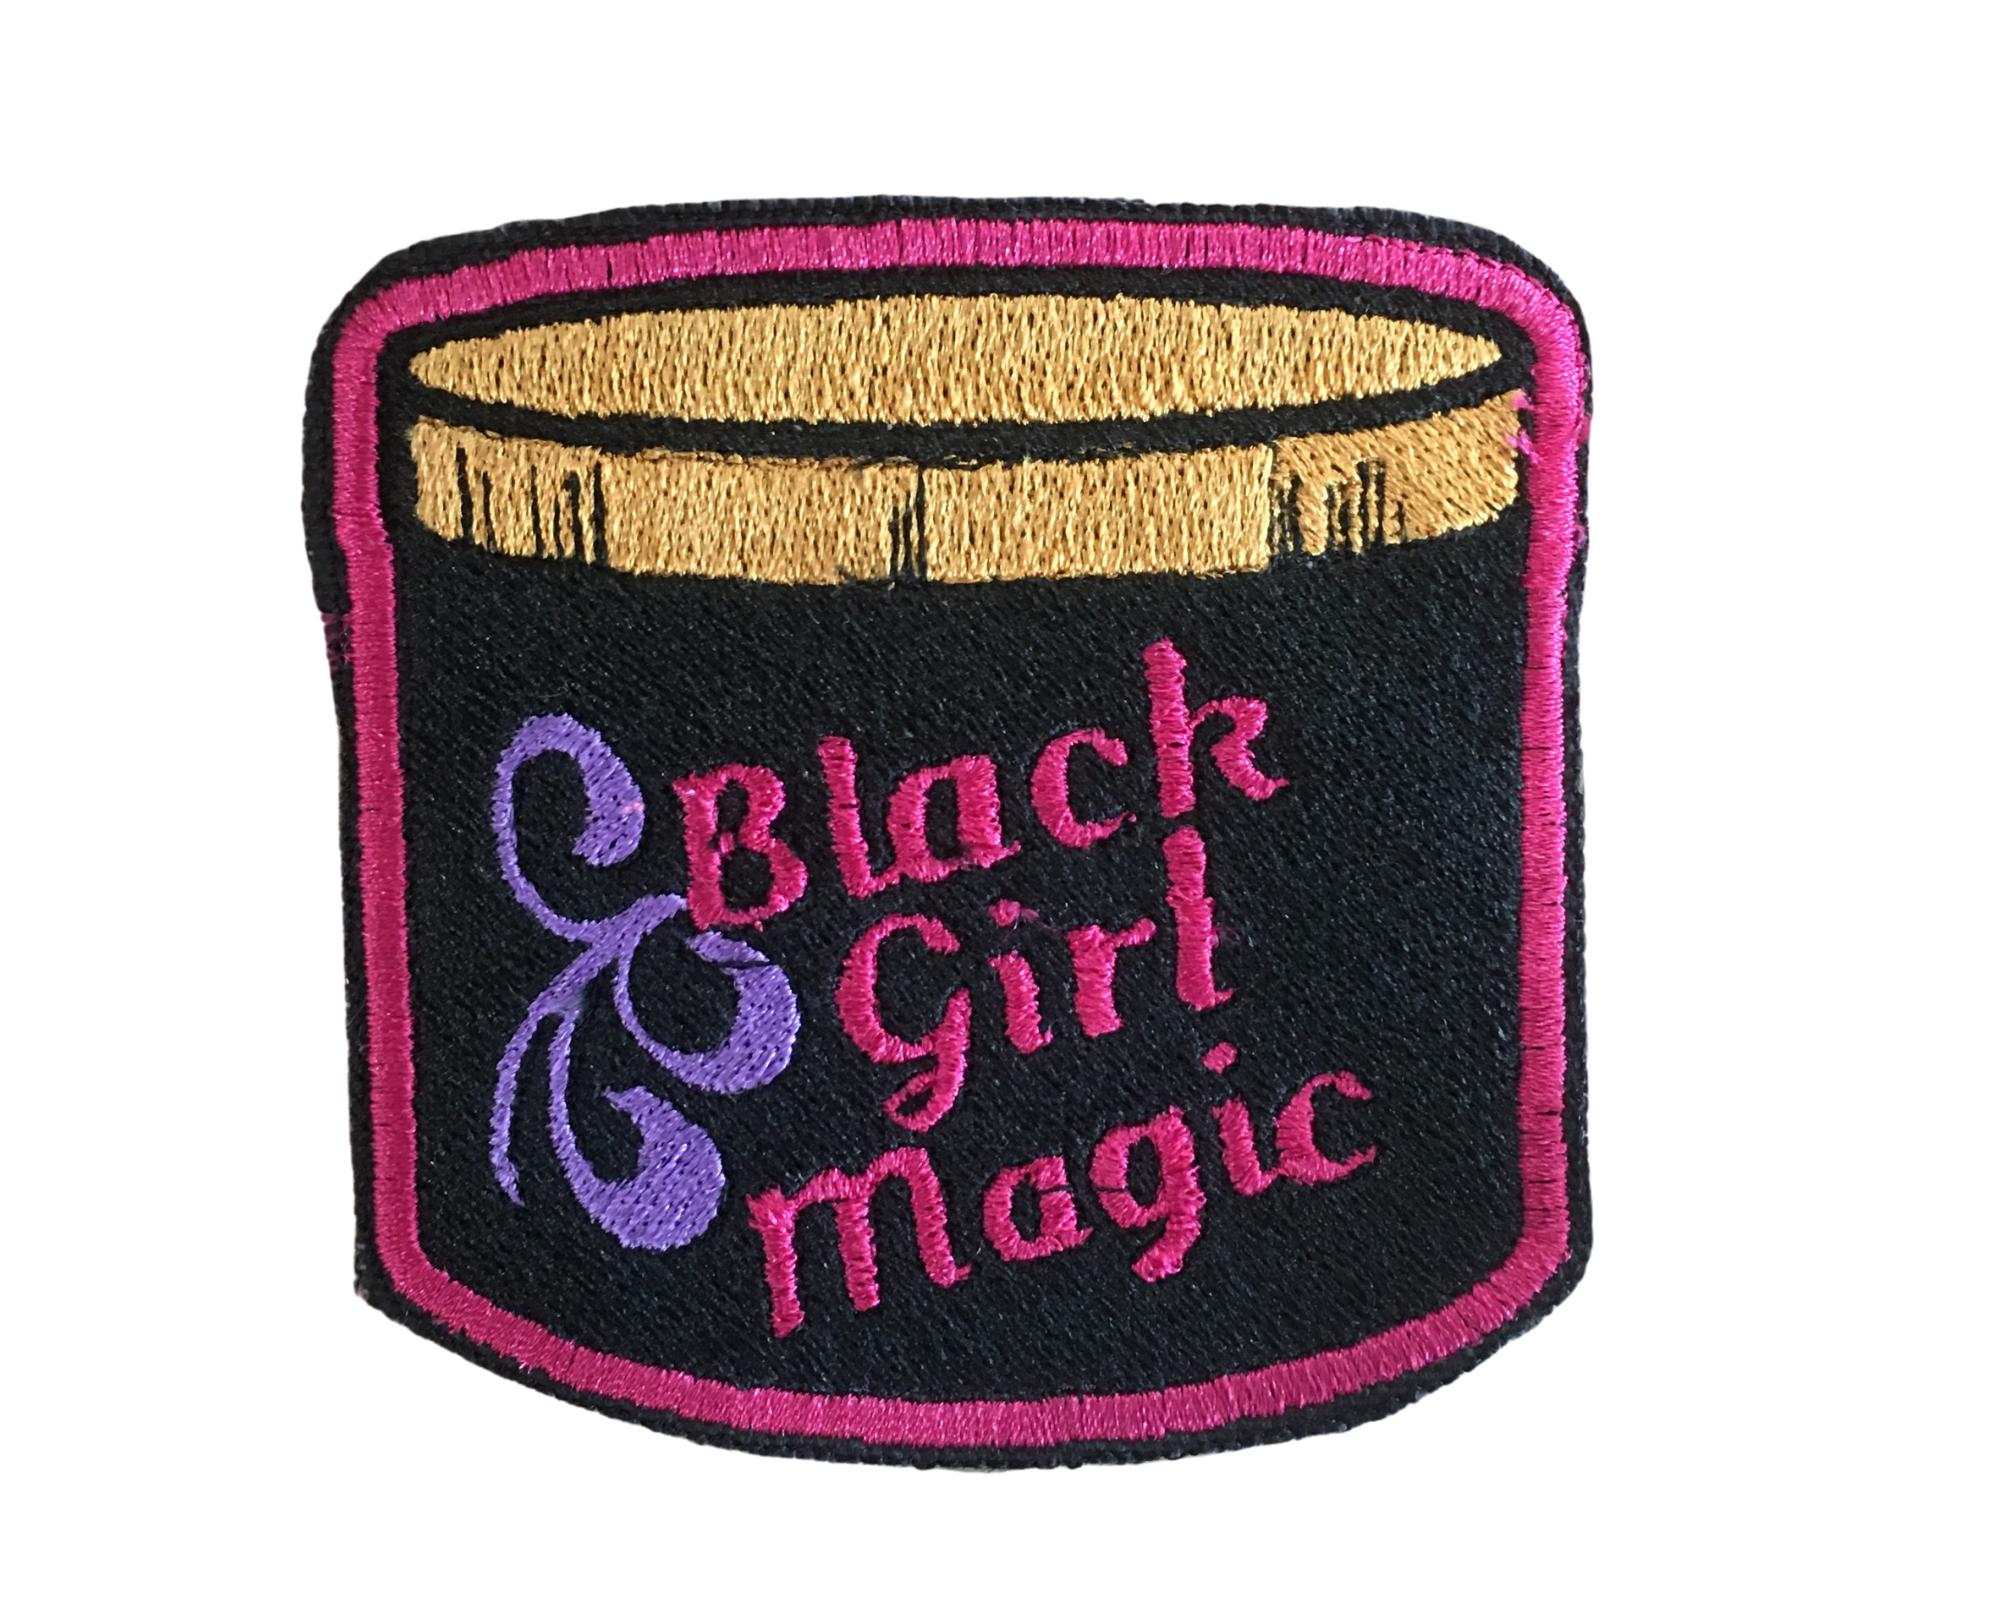 THE SHOP BLACK GIRL MAGIC JAR LARGE PATCH-1